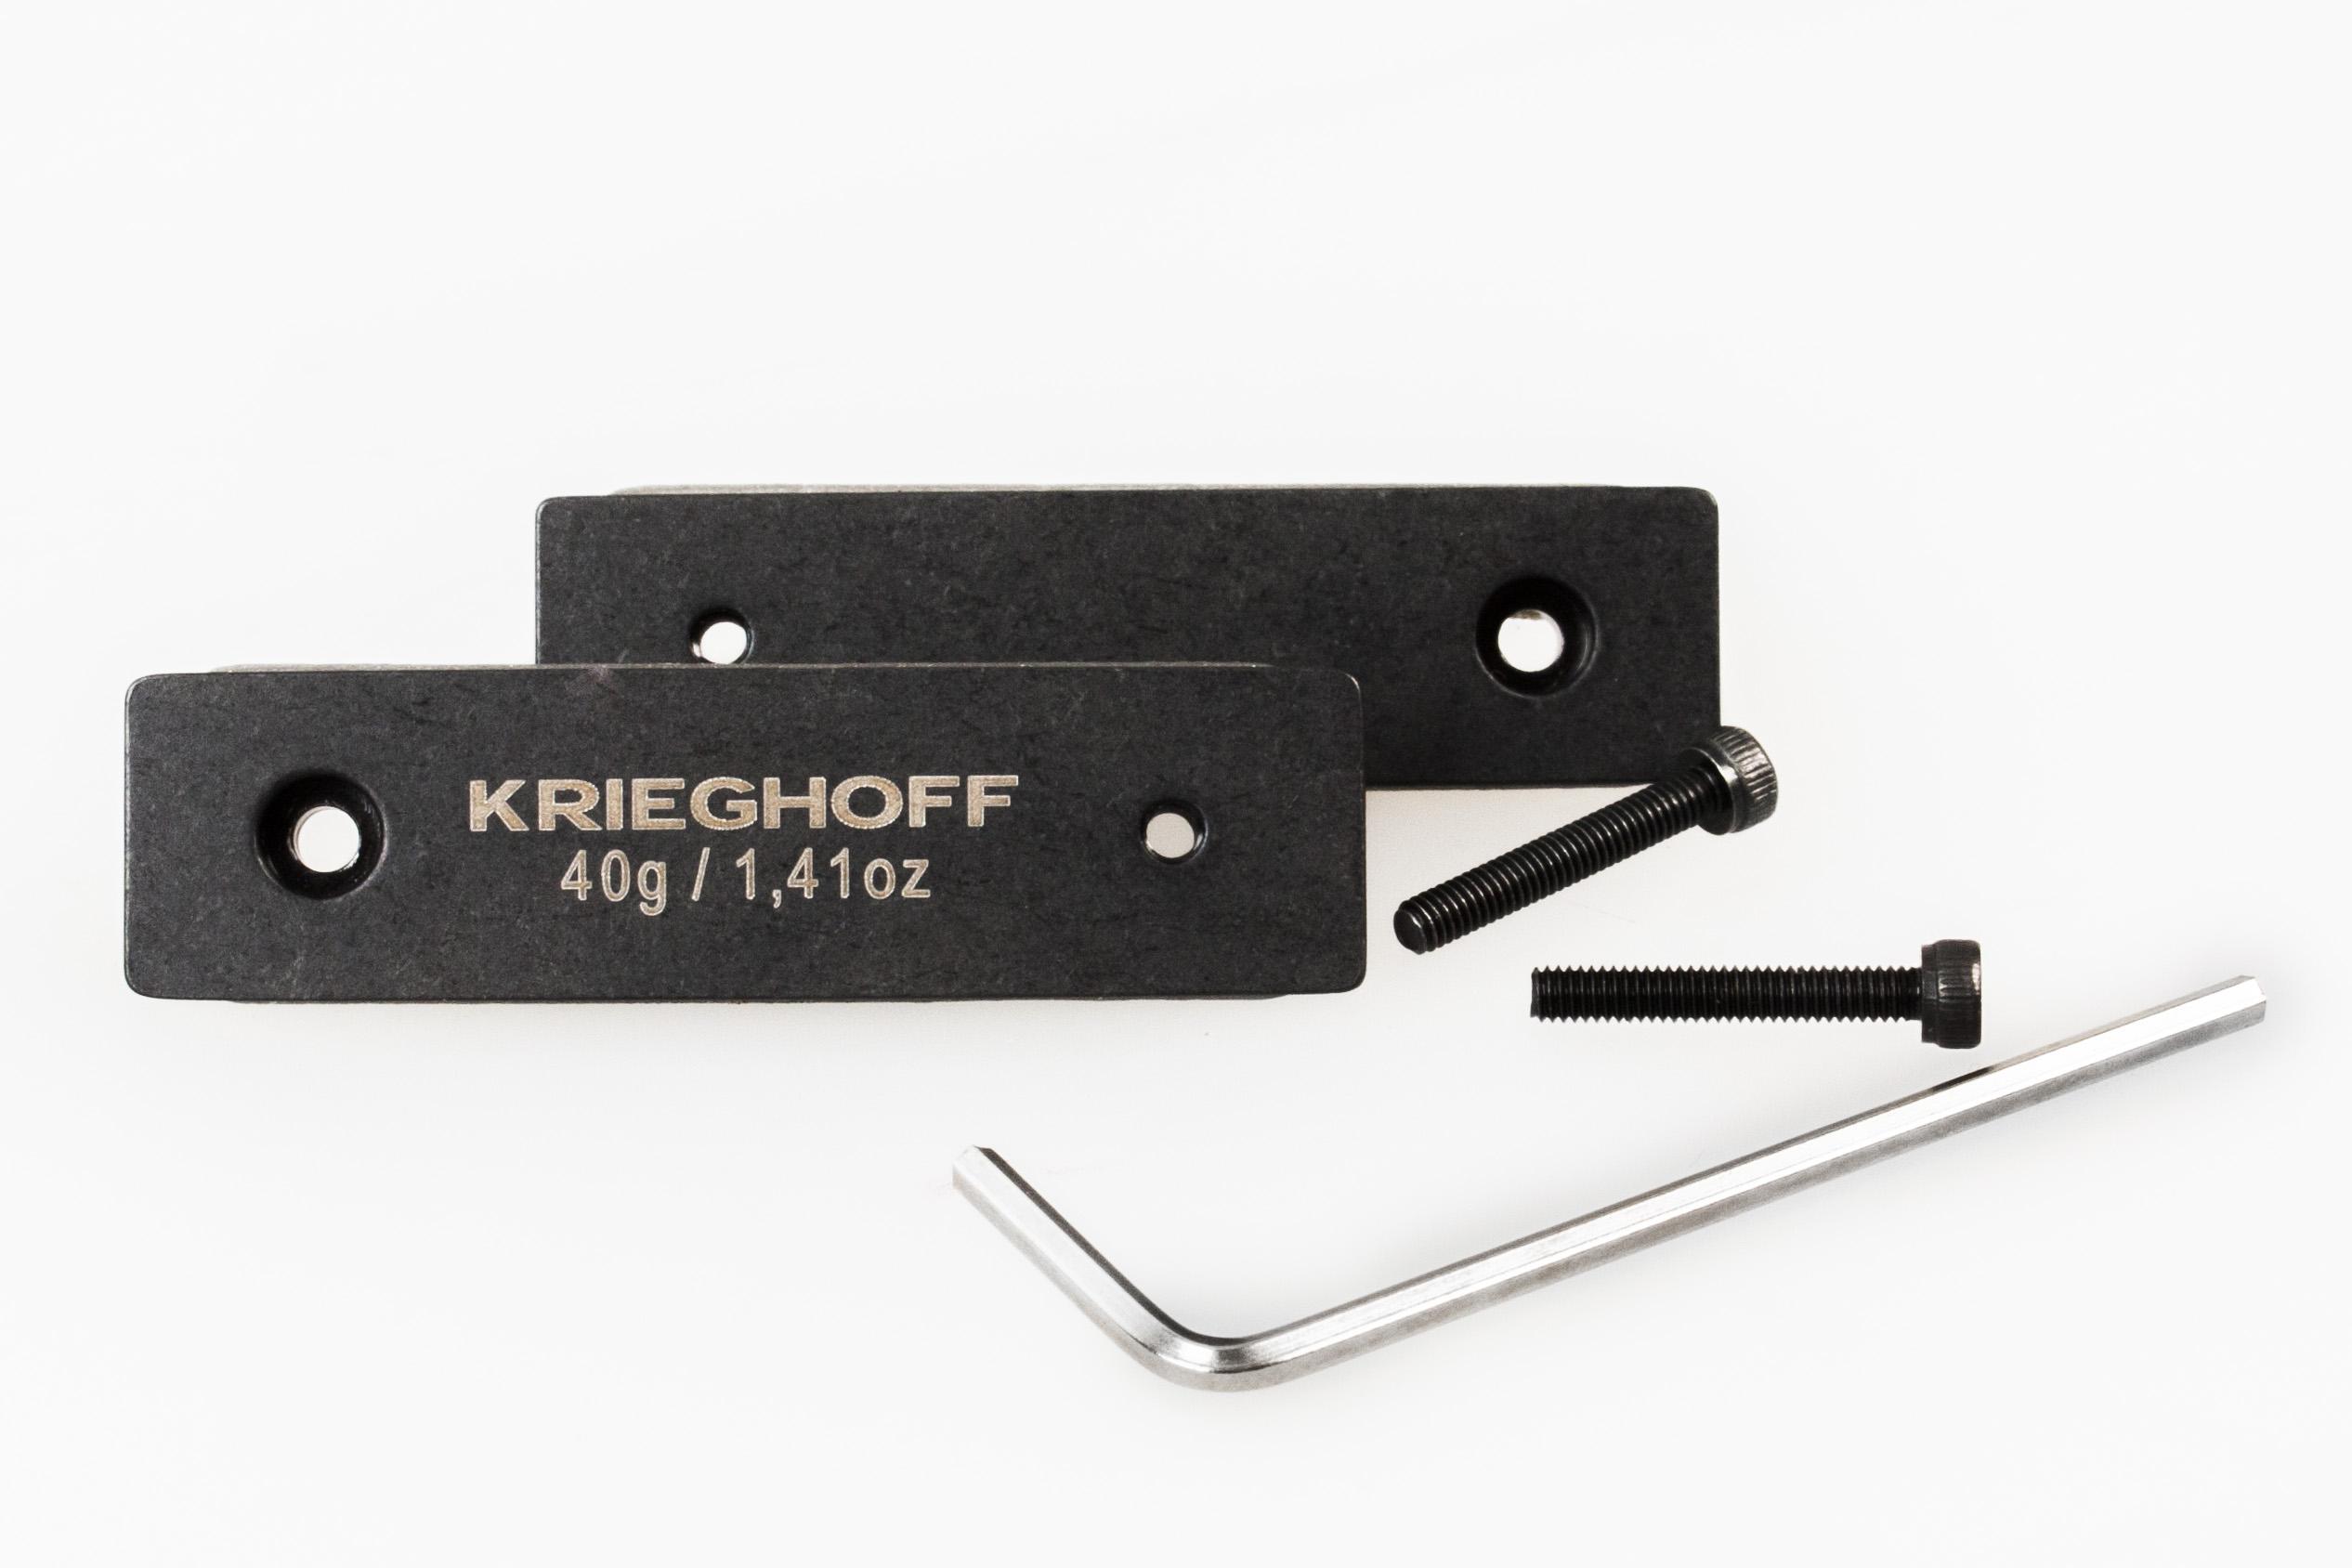 Krieghoff stock options